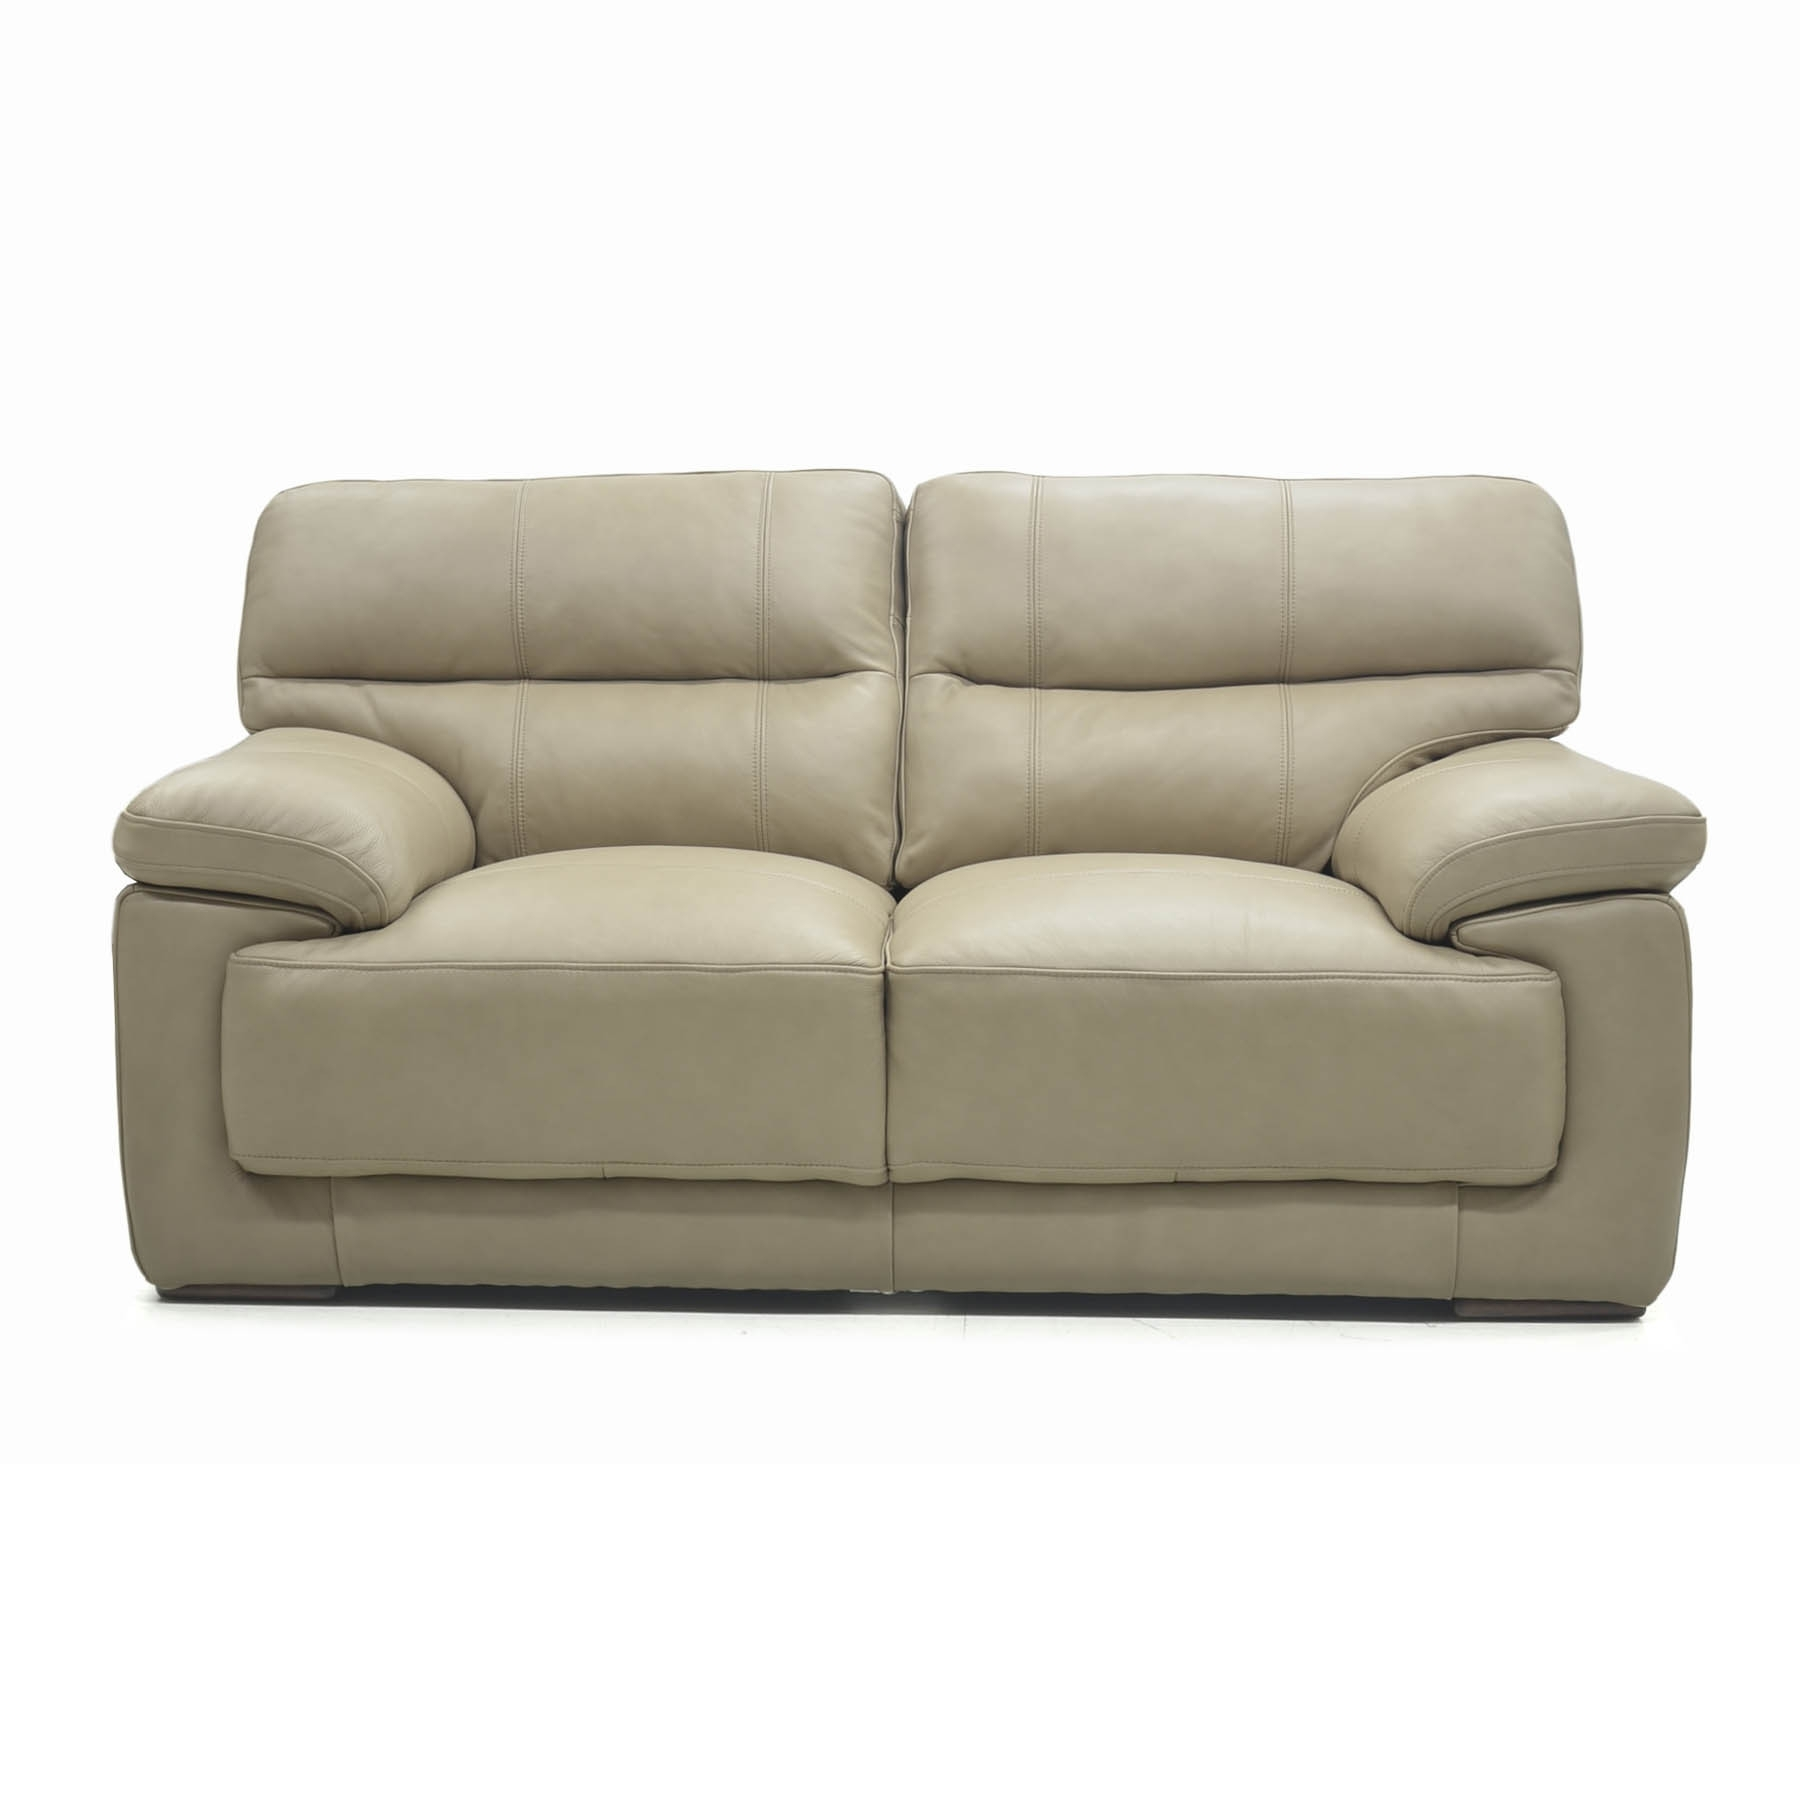 Preferred Florence Medium 2 Seater Sofa With Regard To Florence Medium Sofas (View 12 of 20)